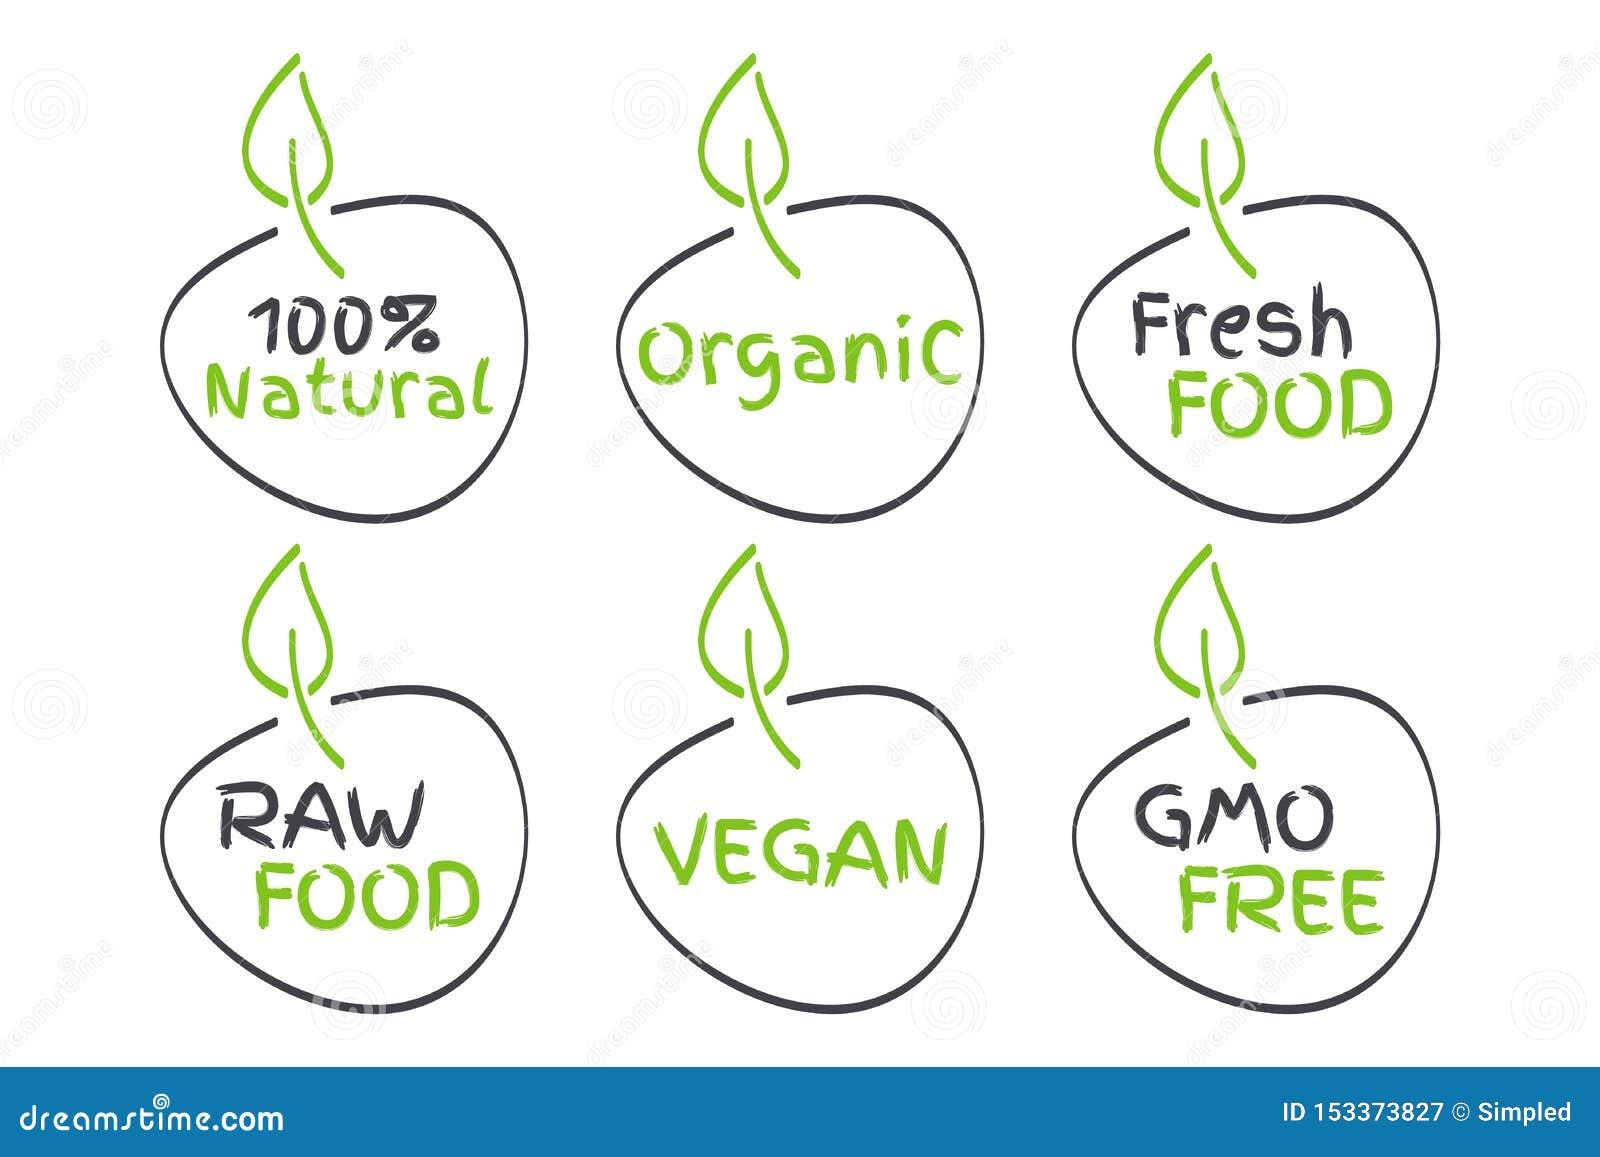 Organic, Vegan, Raw, Fresh Food, GMO Free, 100  Natural labels. Green and grey vector logos, signs. Symbols for healthy eating